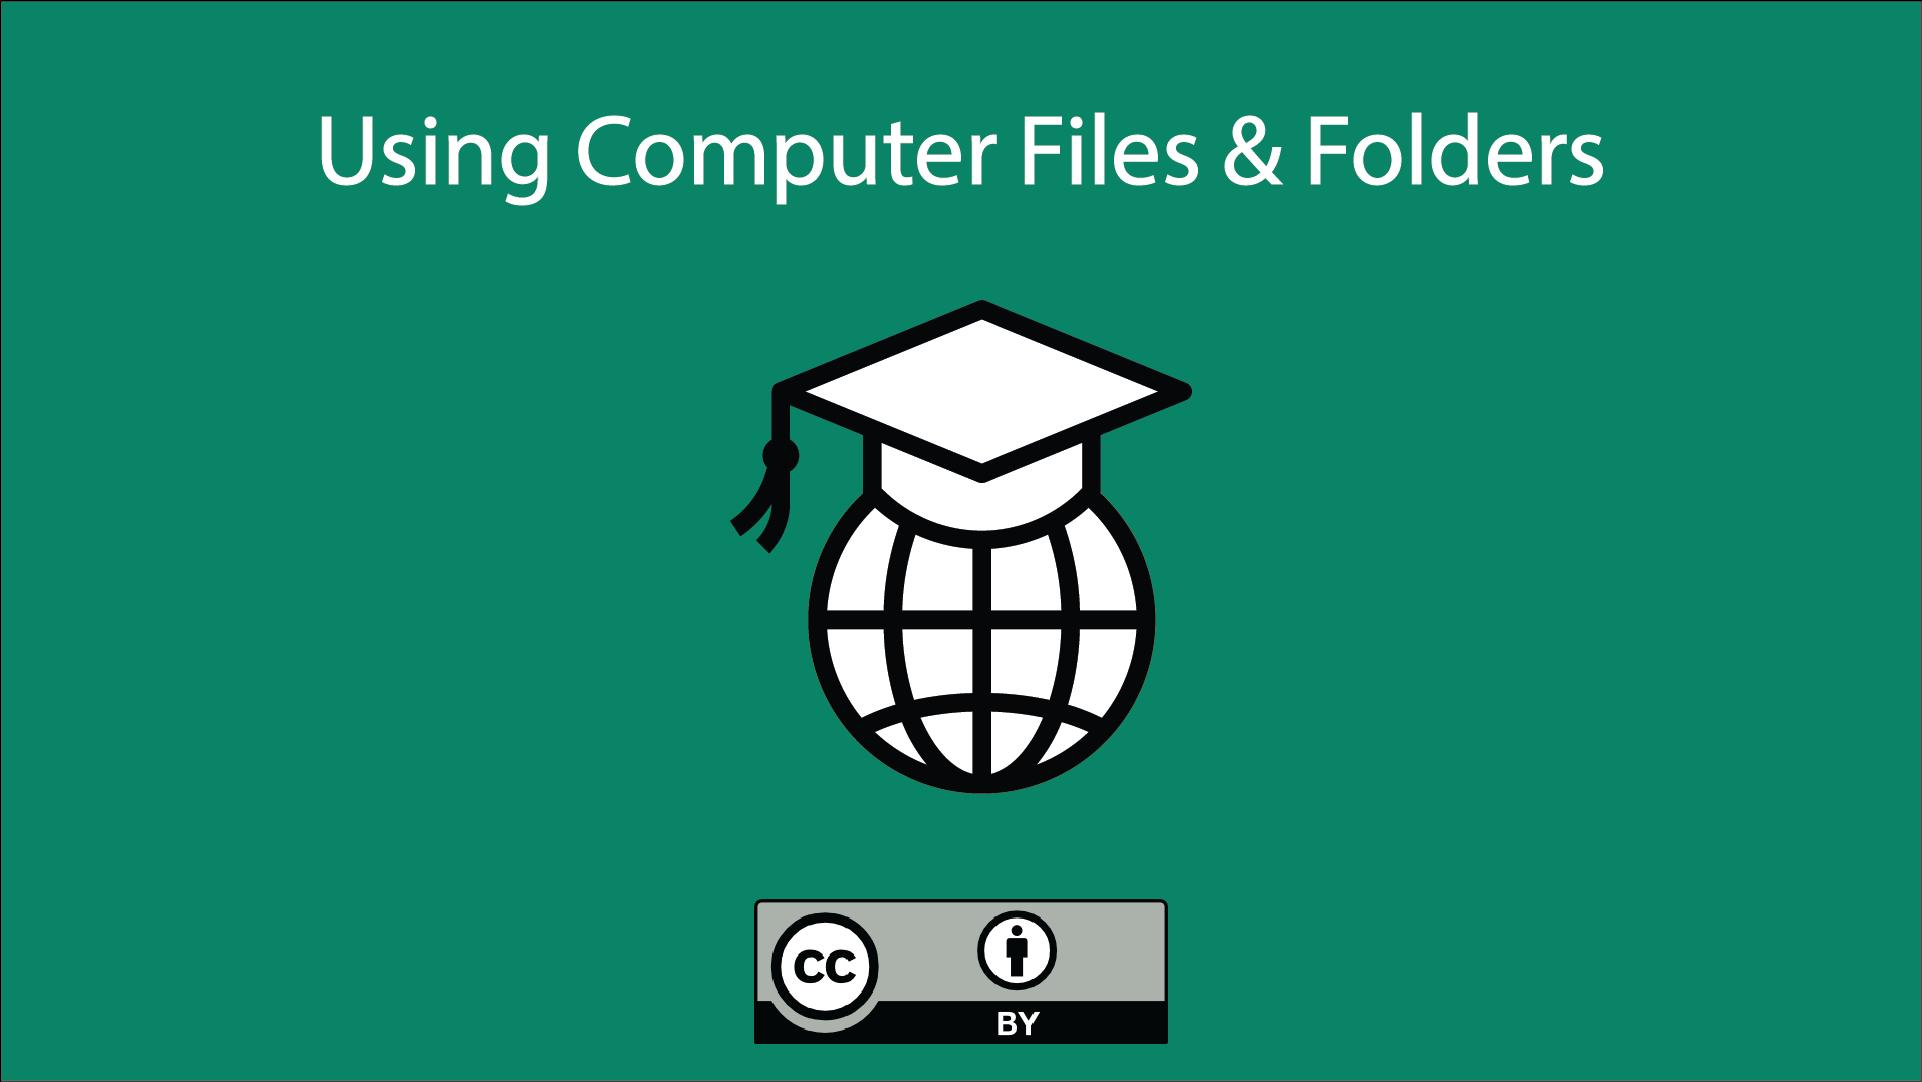 Using Files & Folders